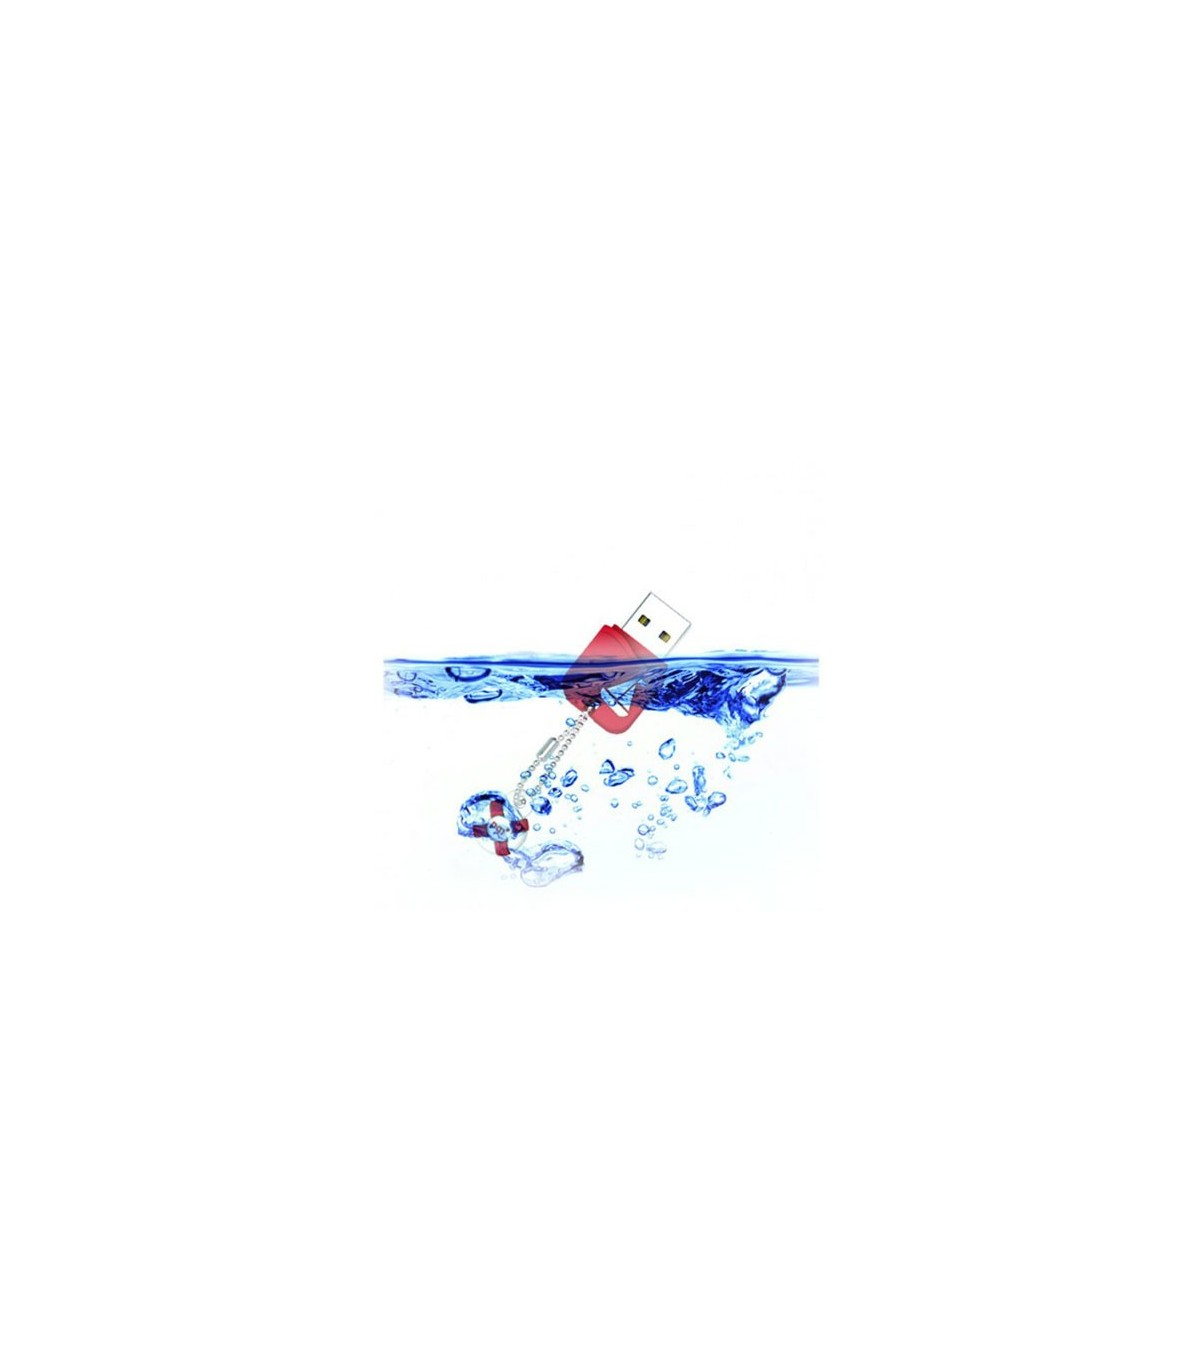 فلش مموری پی کیو آی 16 گیگابایت U605L